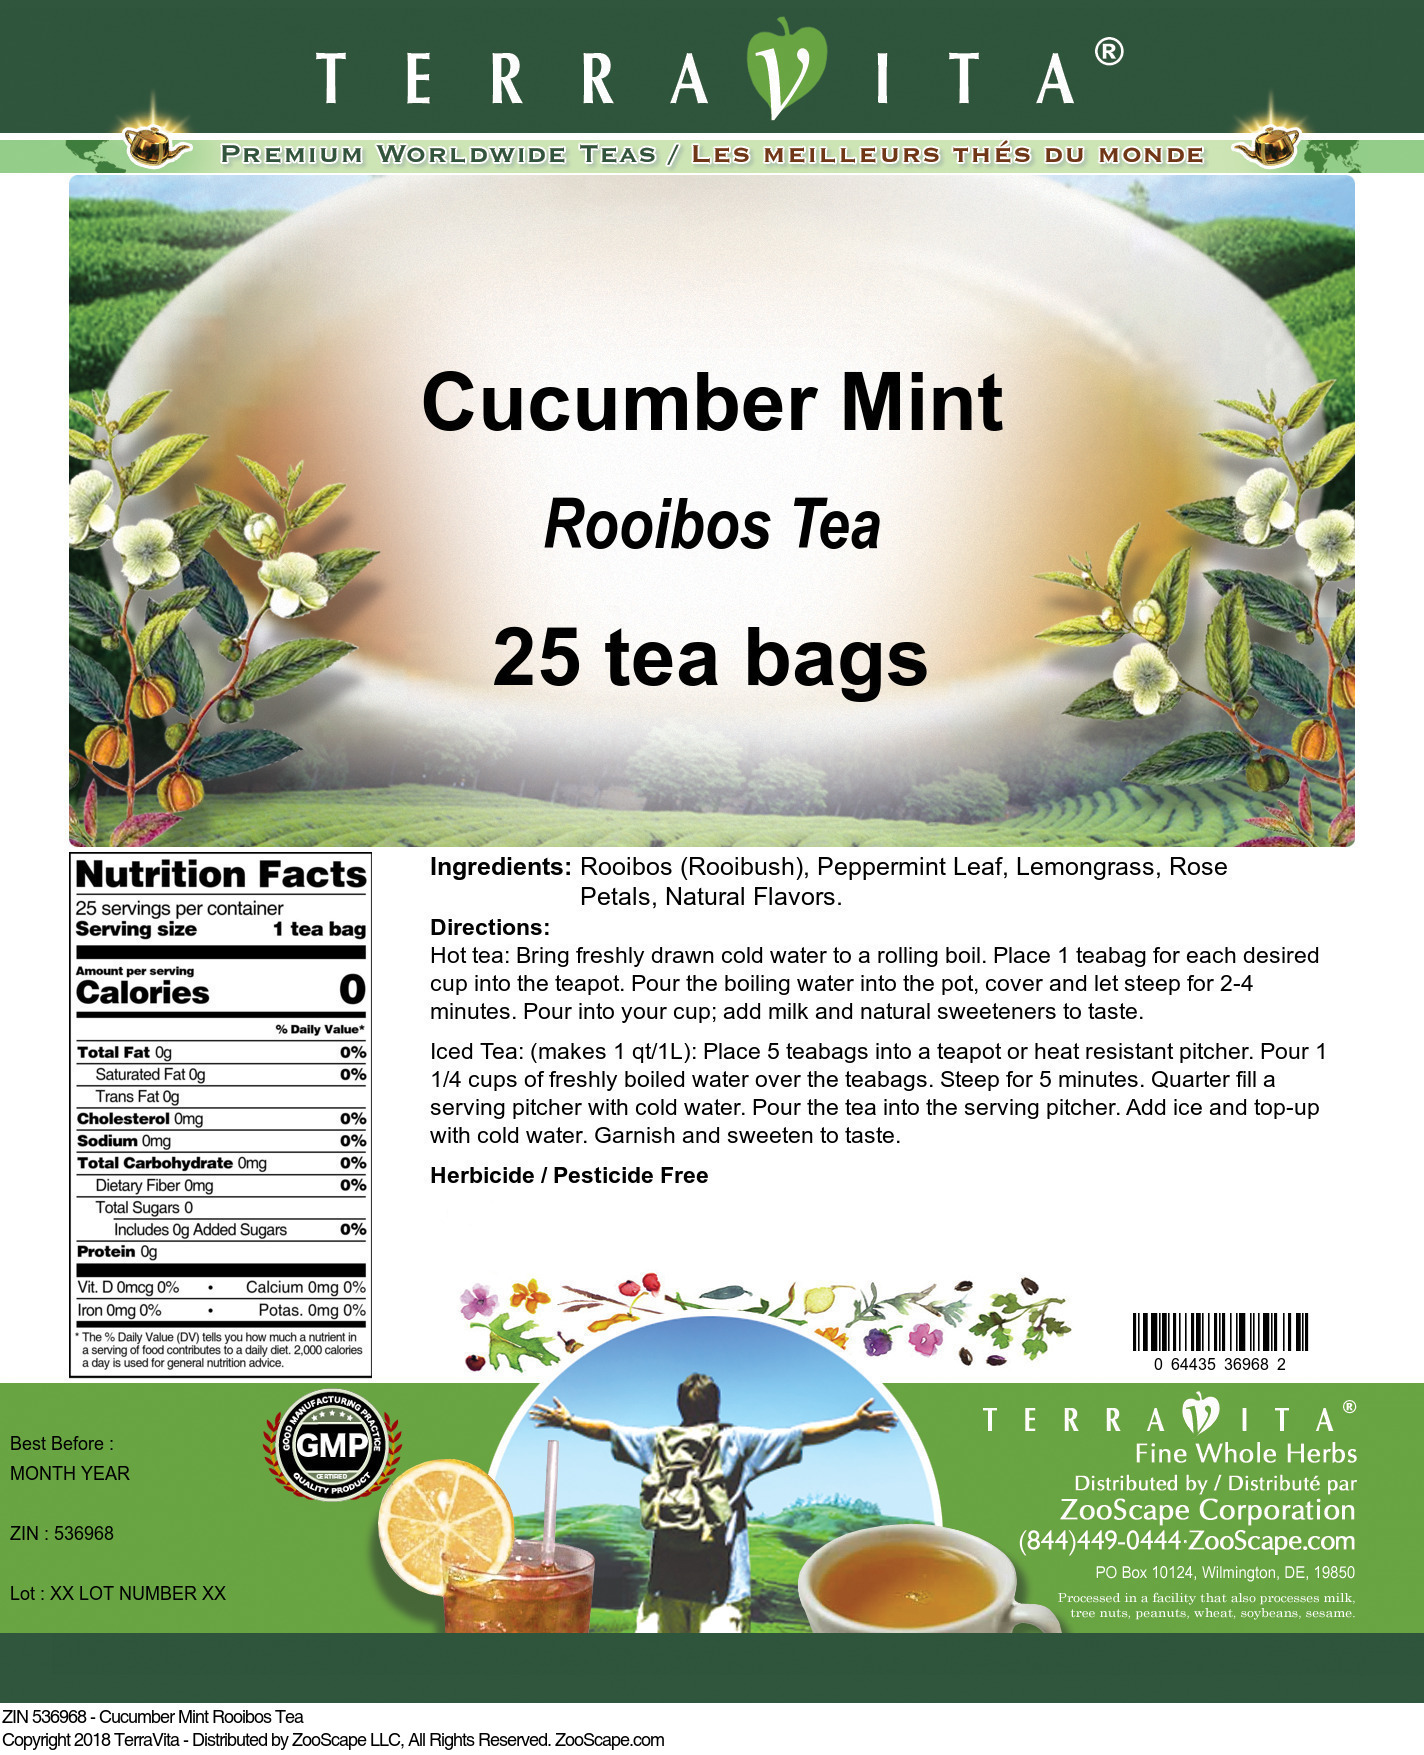 Cucumber Mint Rooibos Tea